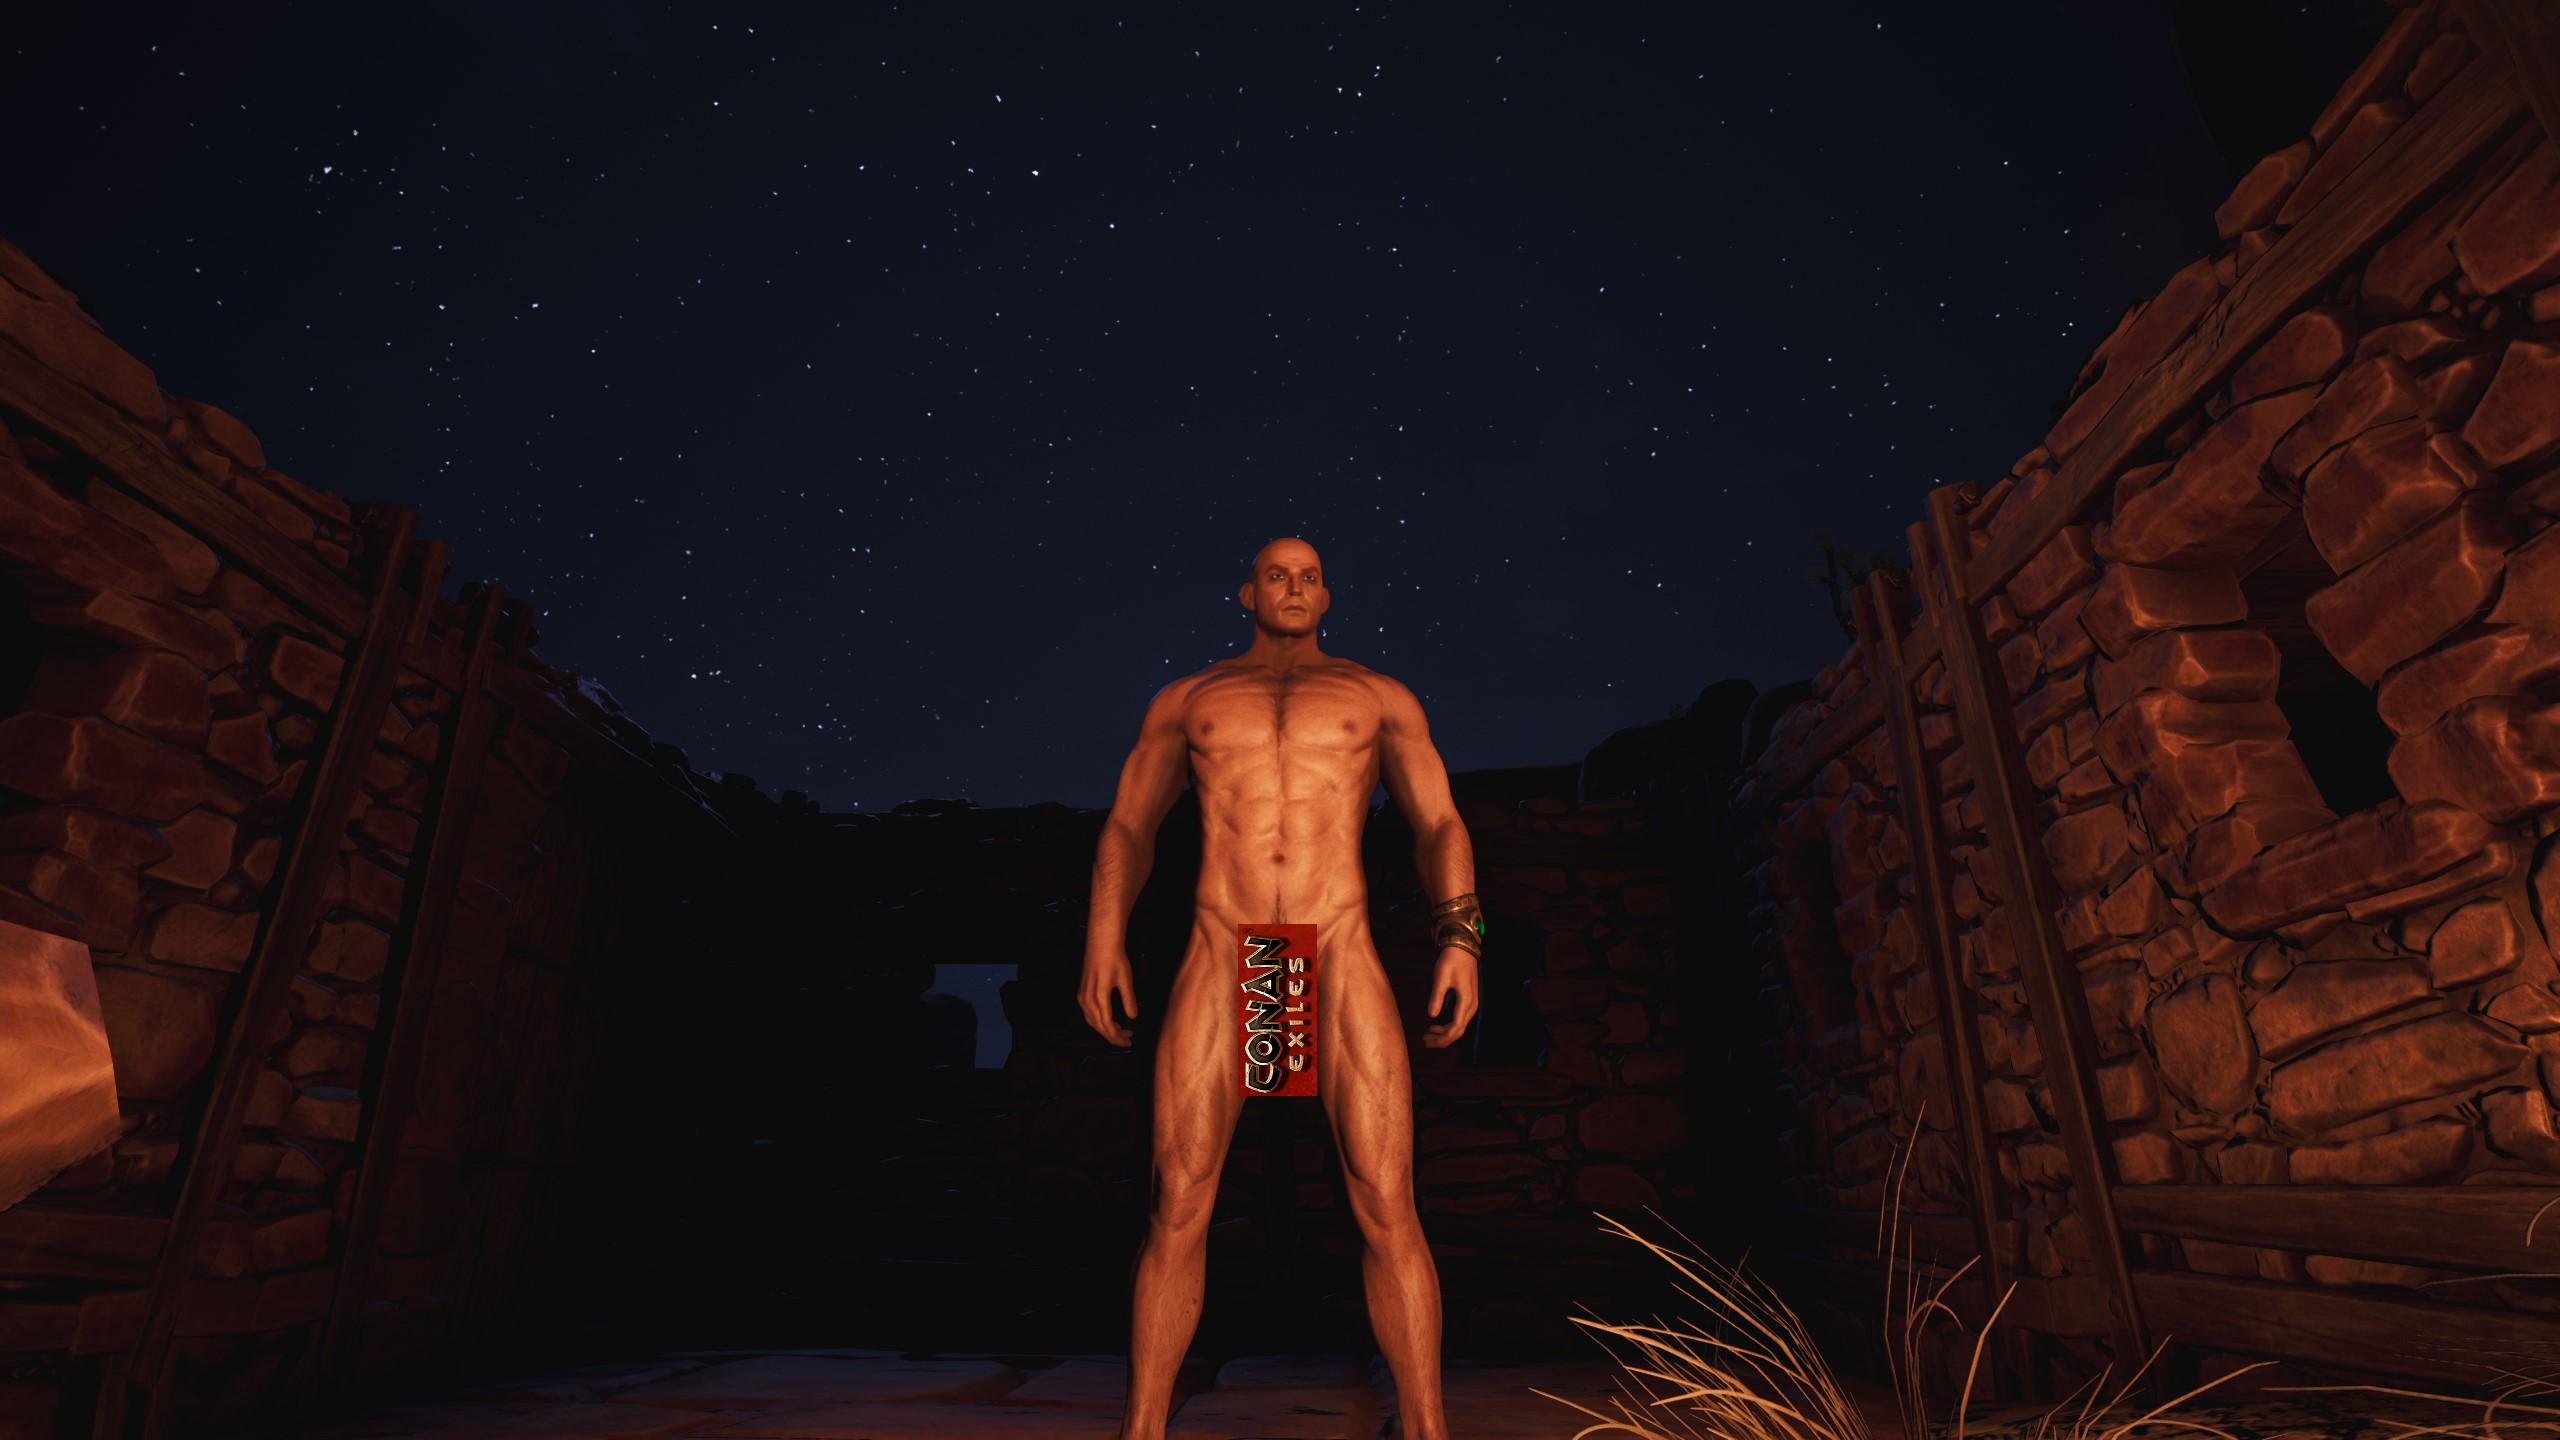 best sex in games pics gallery